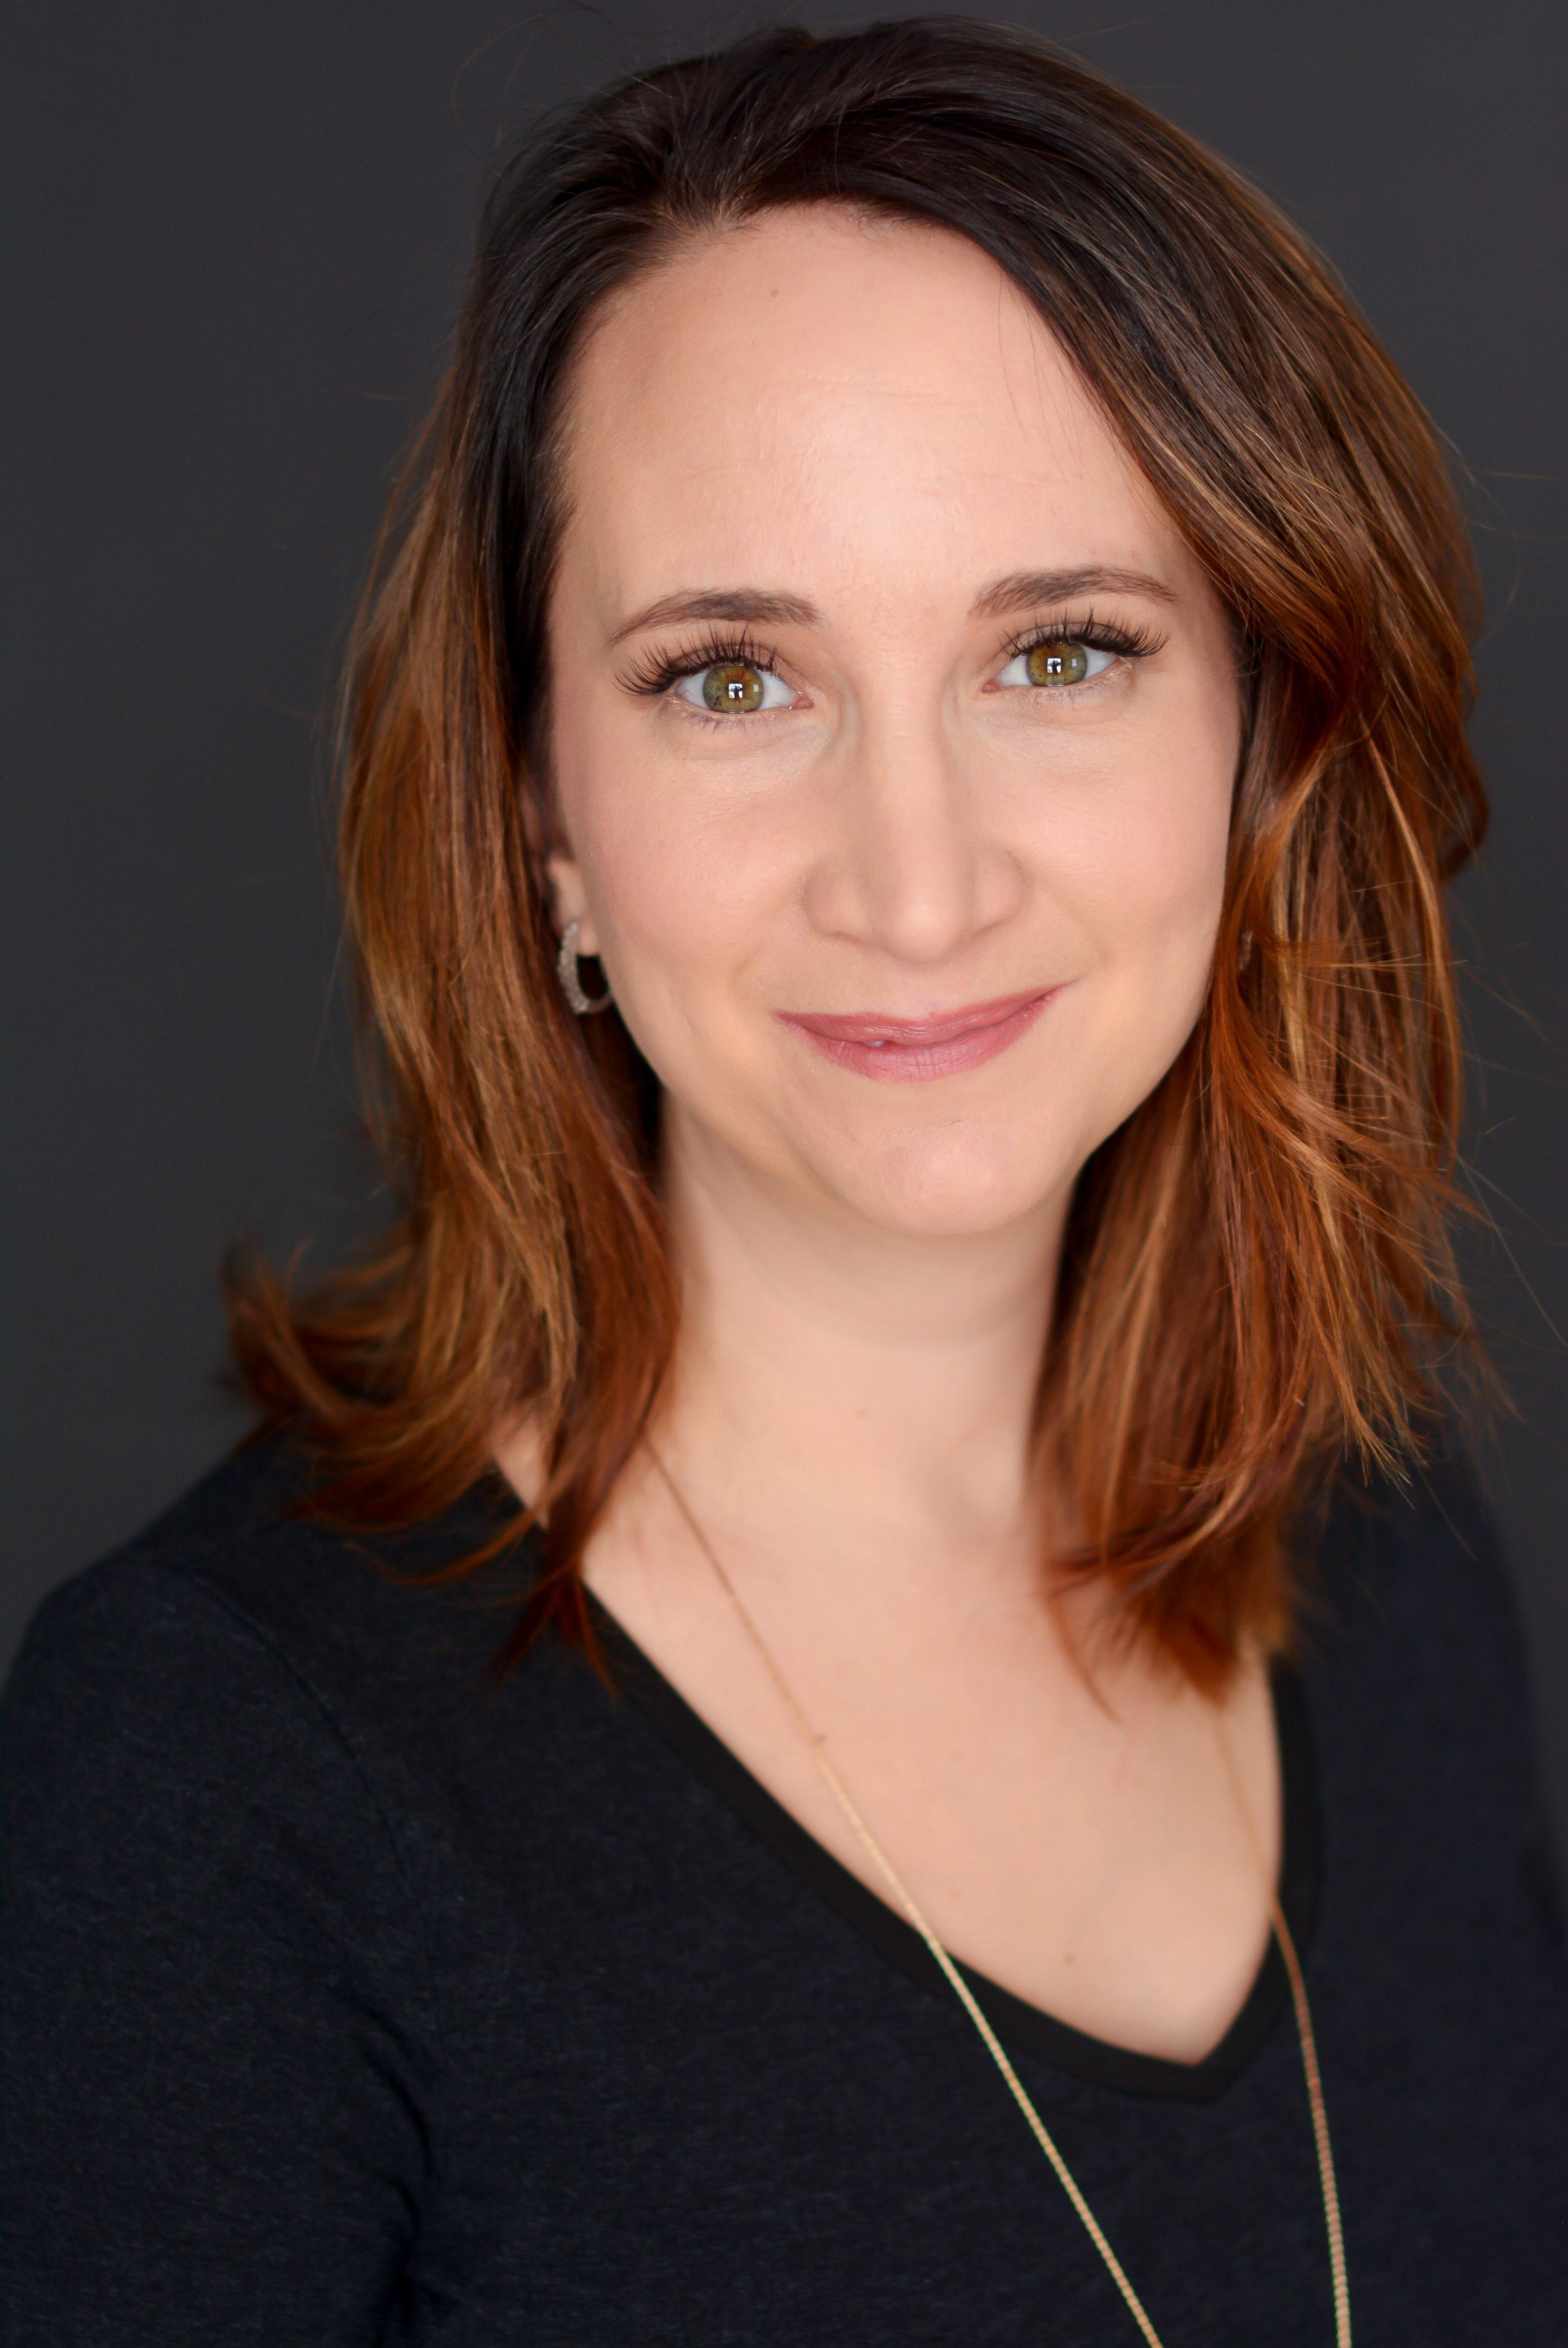 Angela Messina